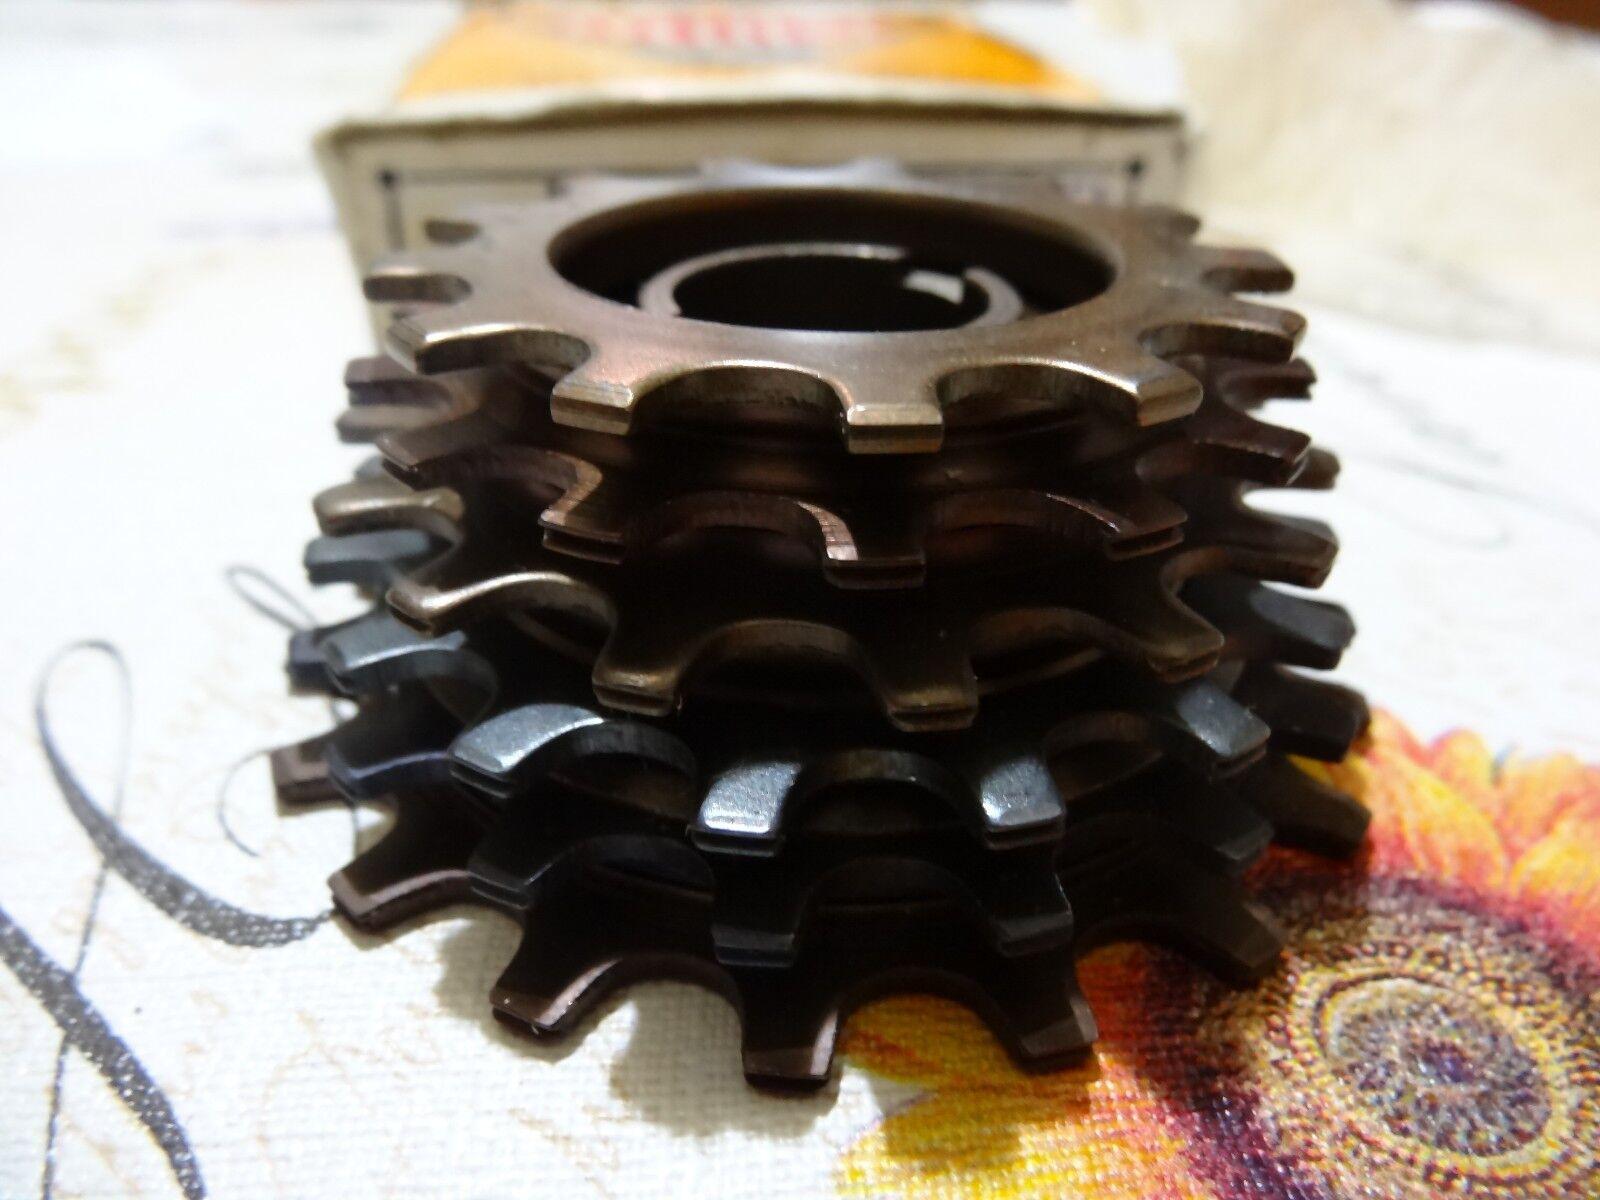 NIB  Everest G.Caimi freewheel,cassette 6  speed 13 18 Eroica  online fashion shopping